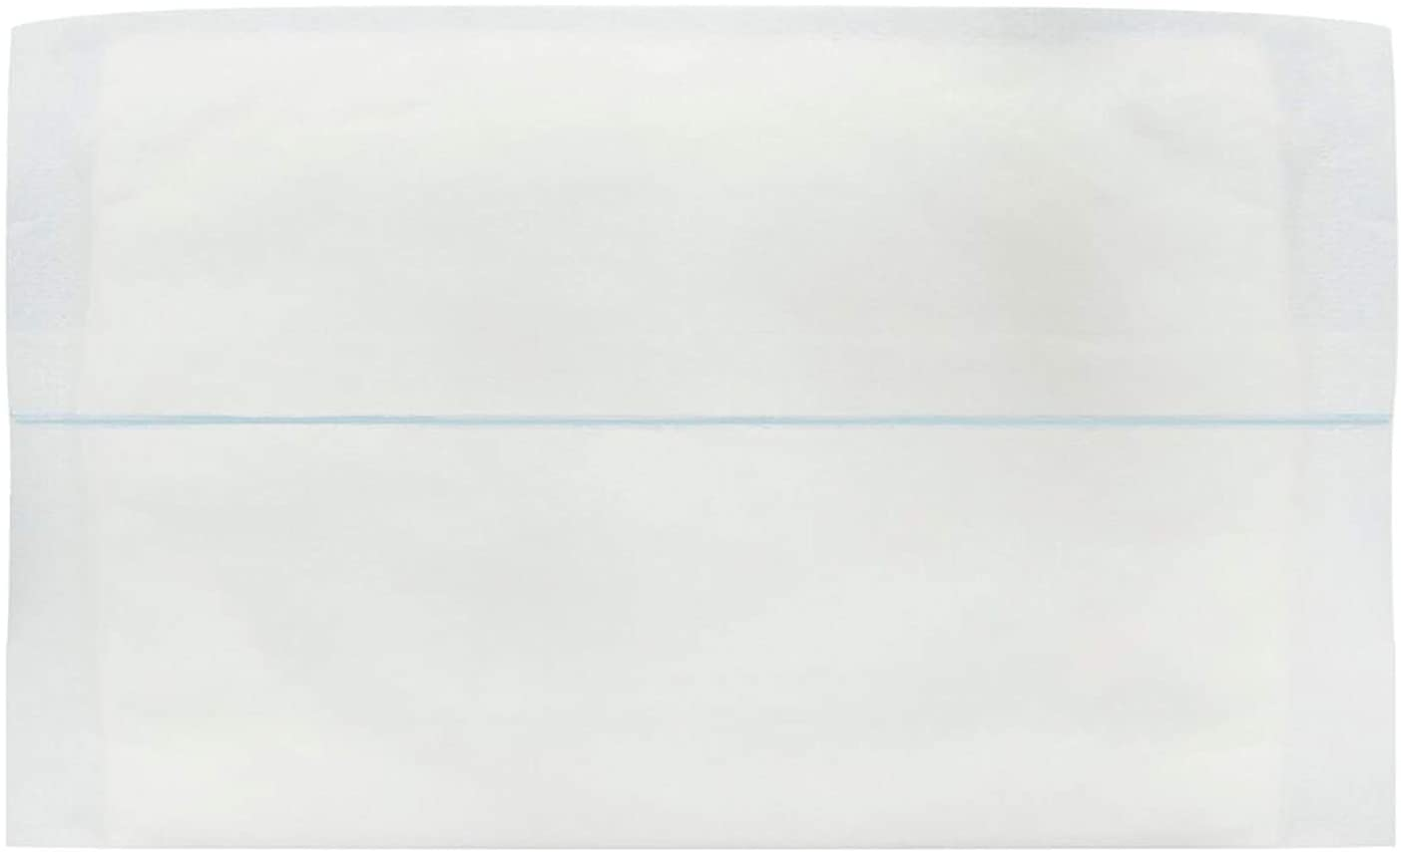 Dukal Combine ABD Pads, Sterile, 5